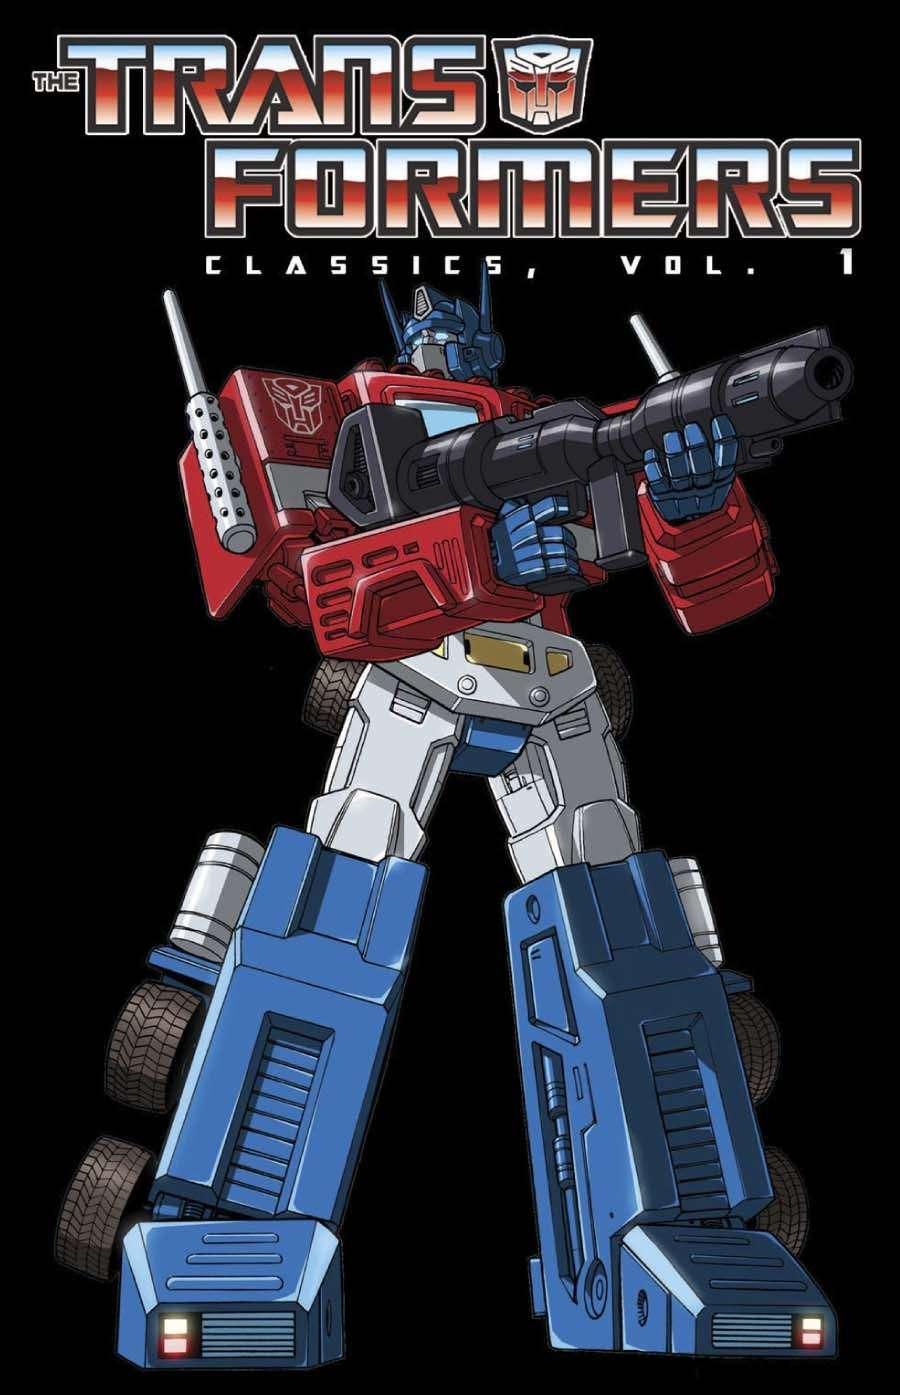 The Transformers Classics, Volume 1